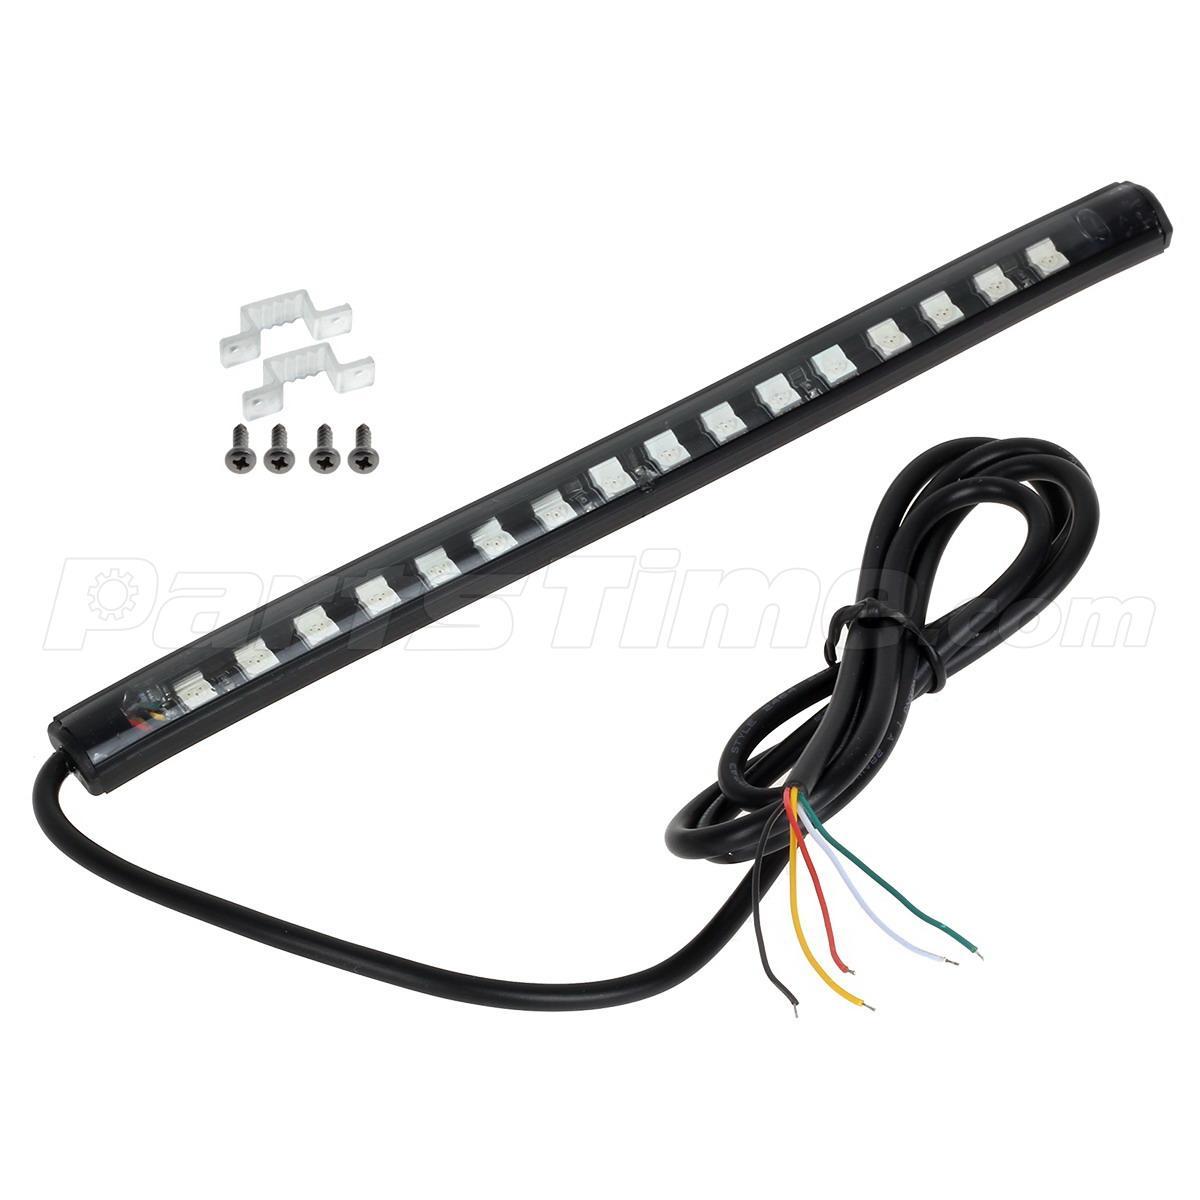 20cm integrated tail brake  u0026 turn signal led light strip